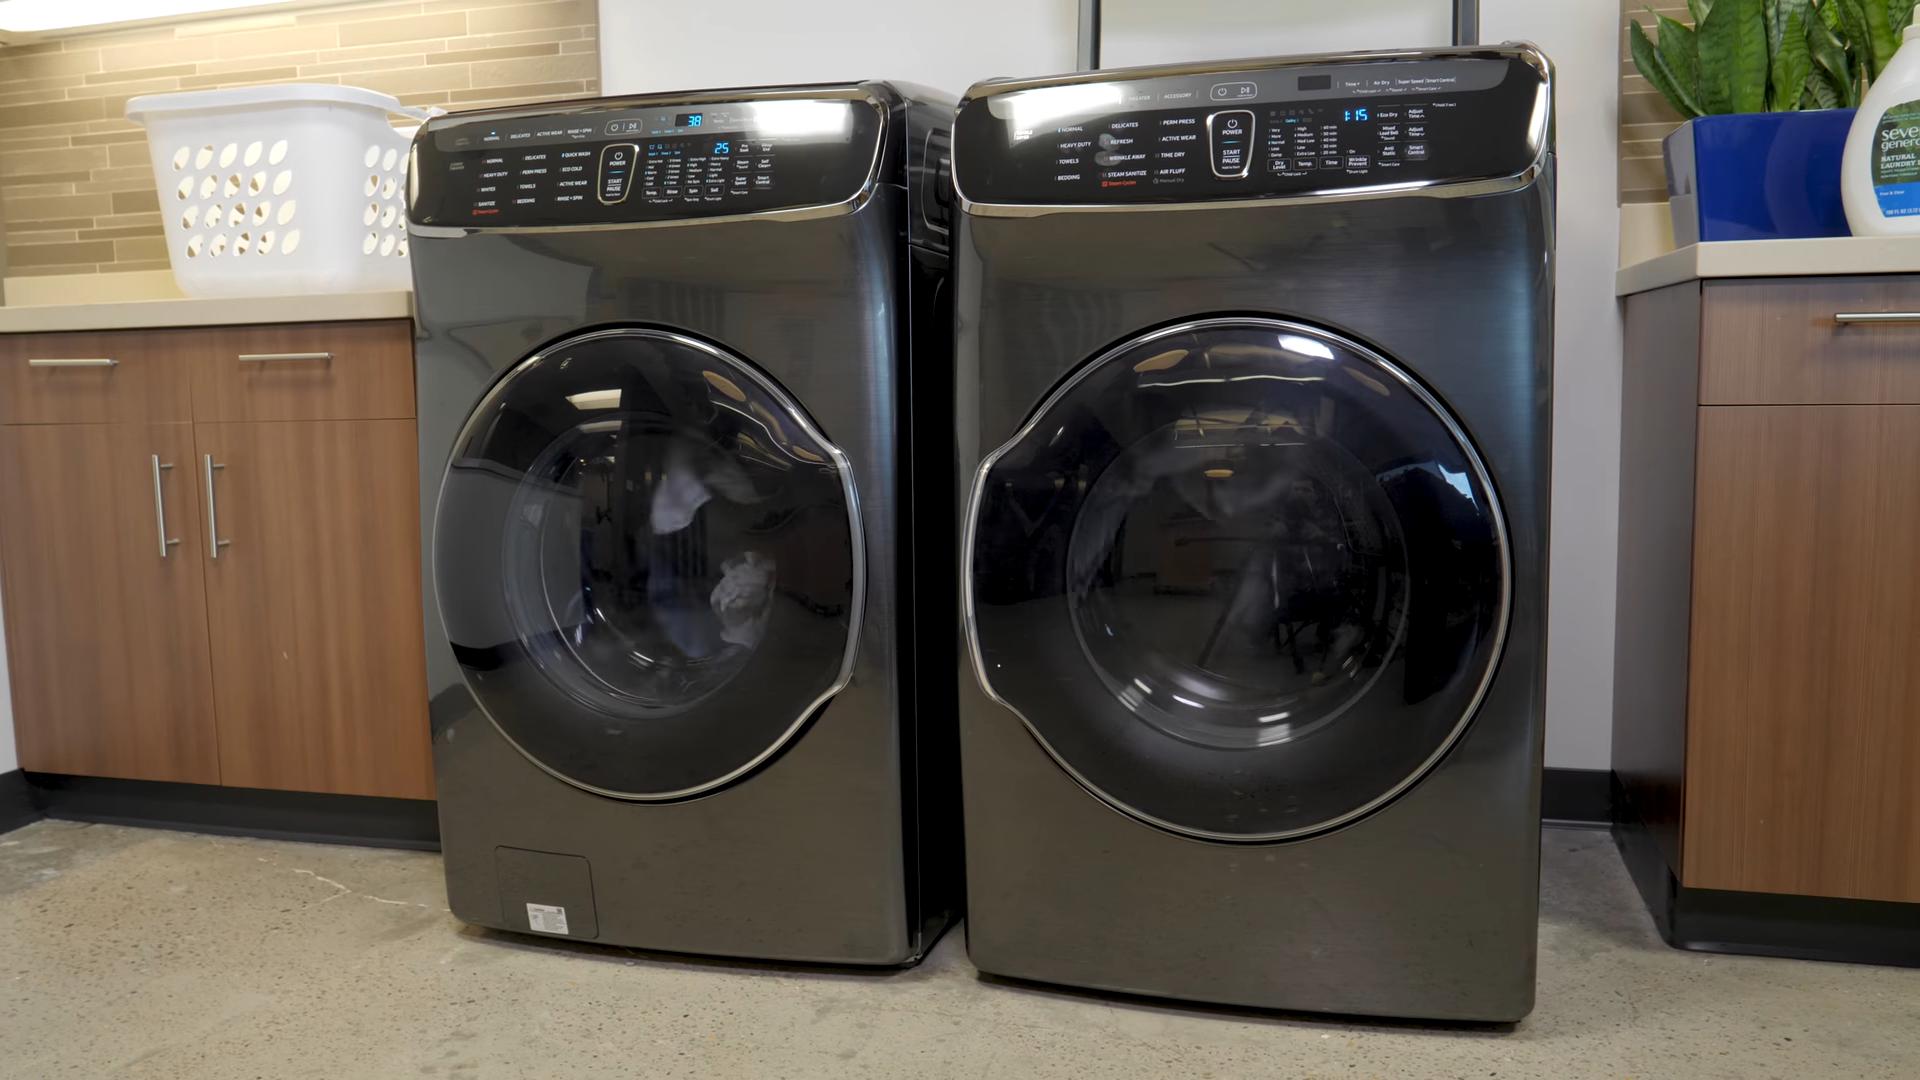 Washing Machine Pictures Washing Machine Washing Machine Drain Hose Washing Machine Black